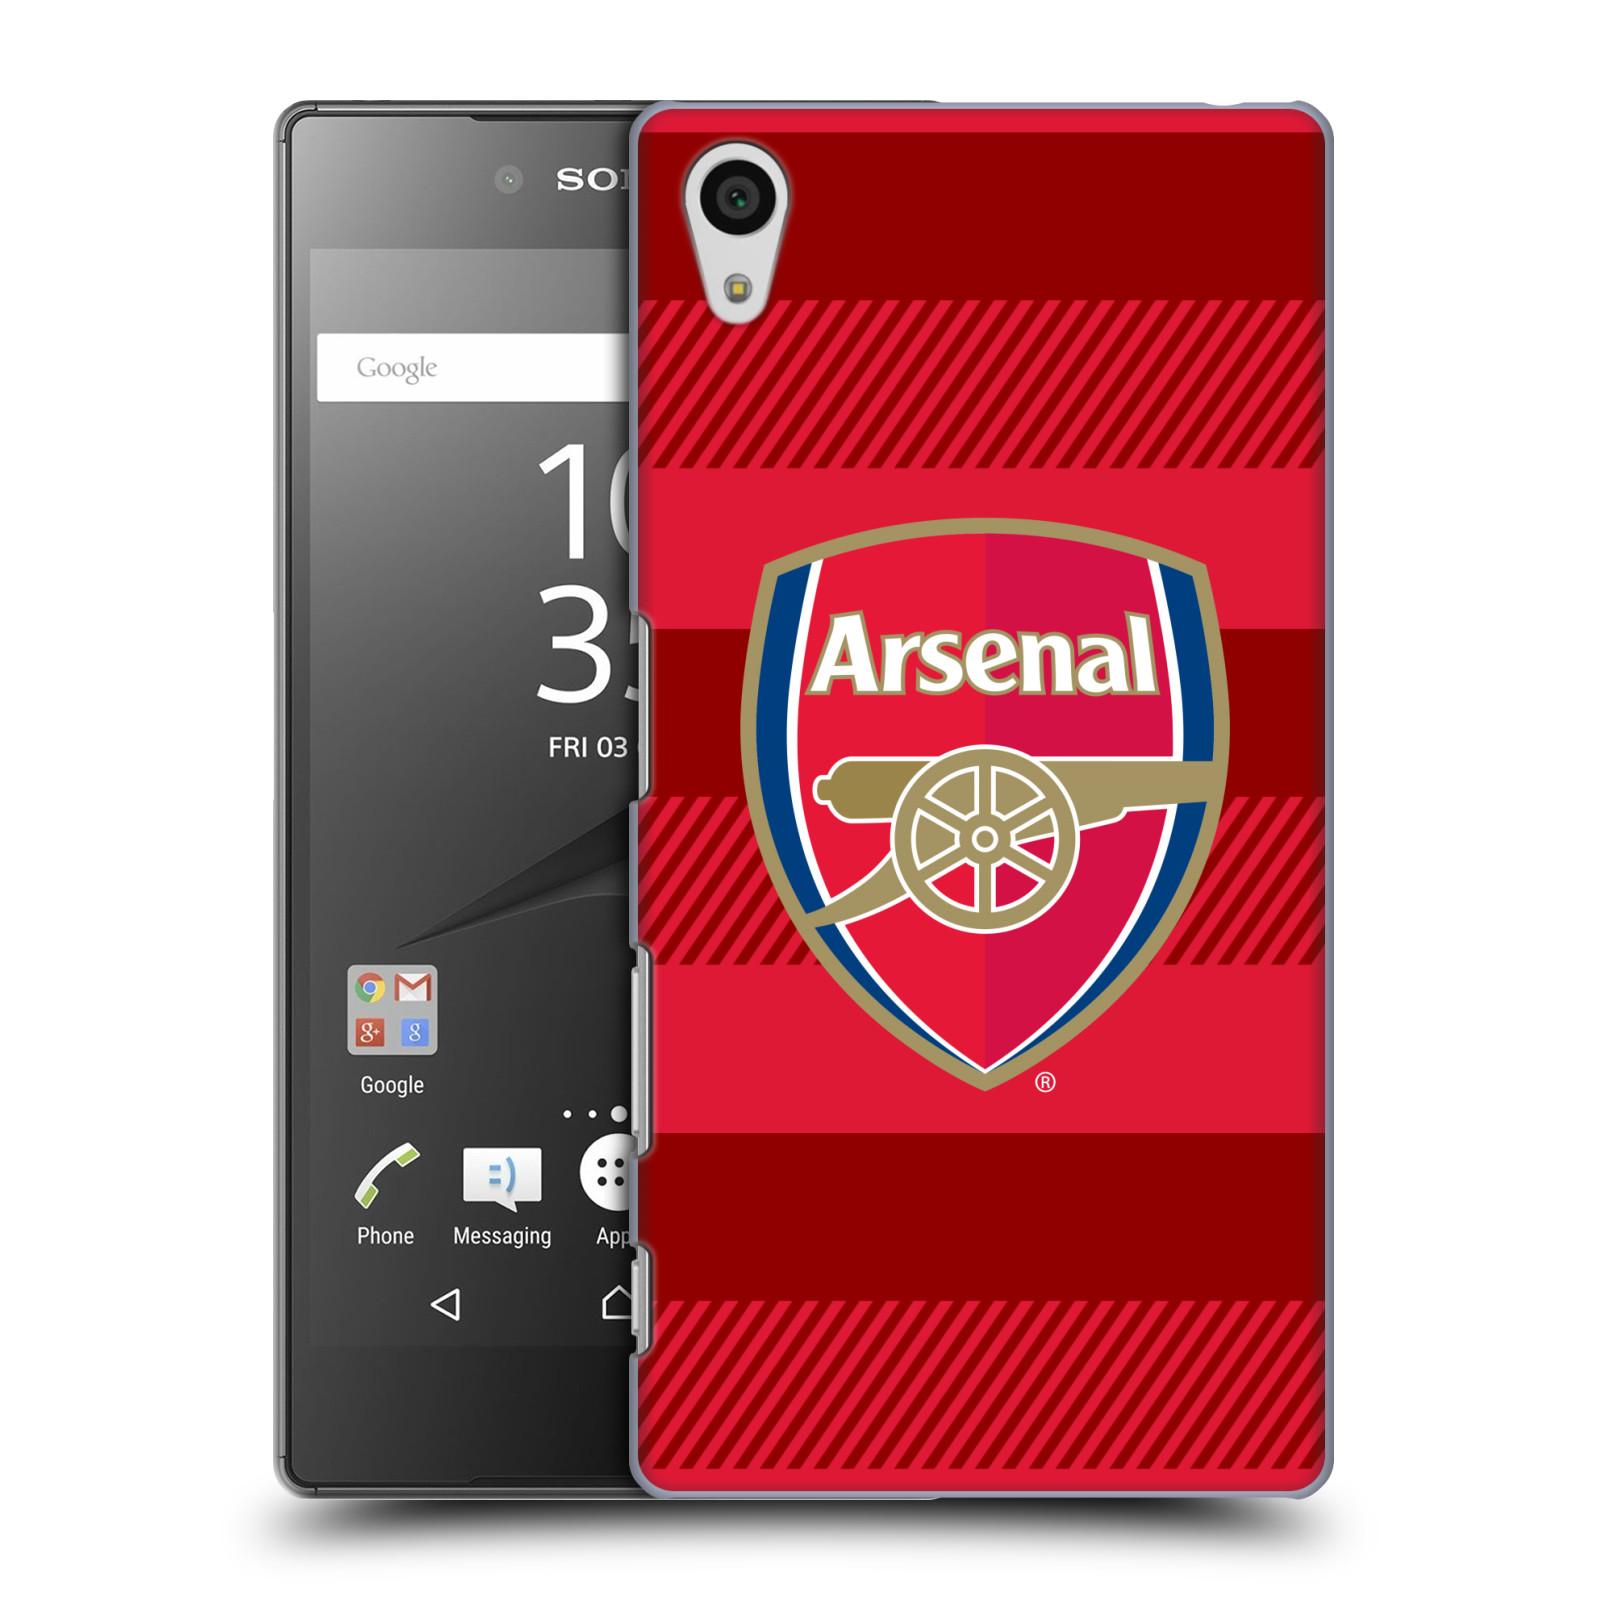 Plastové pouzdro na mobil Sony Xperia Z5 - Head Case - Arsenal FC - Logo s pruhy